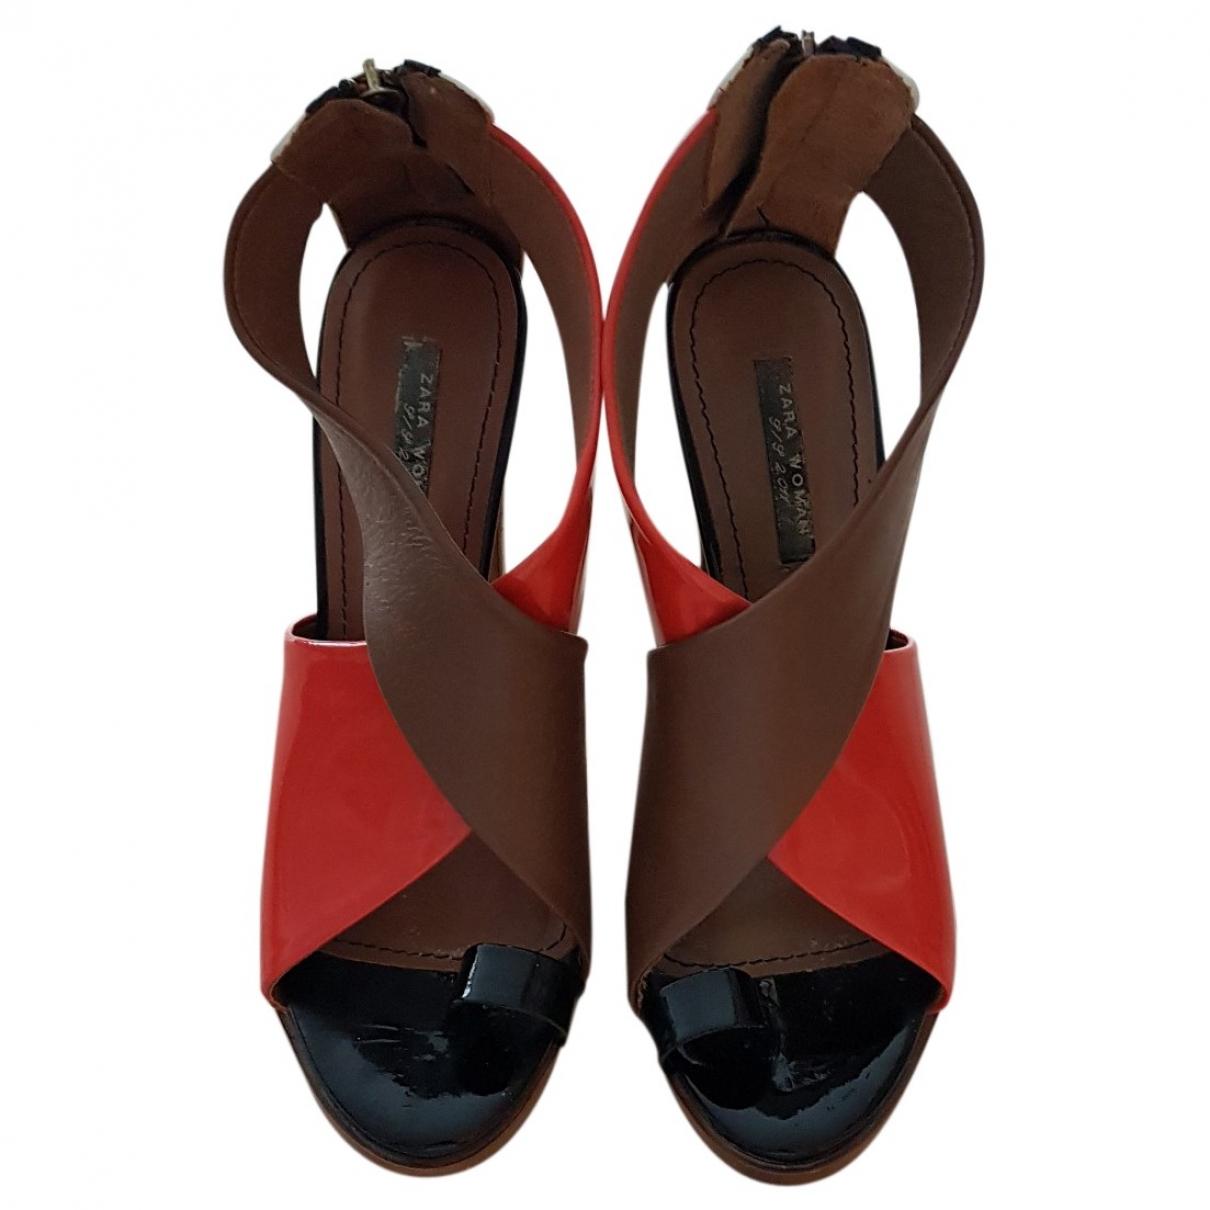 Zara \N Multicolour Patent leather Sandals for Women 38 EU